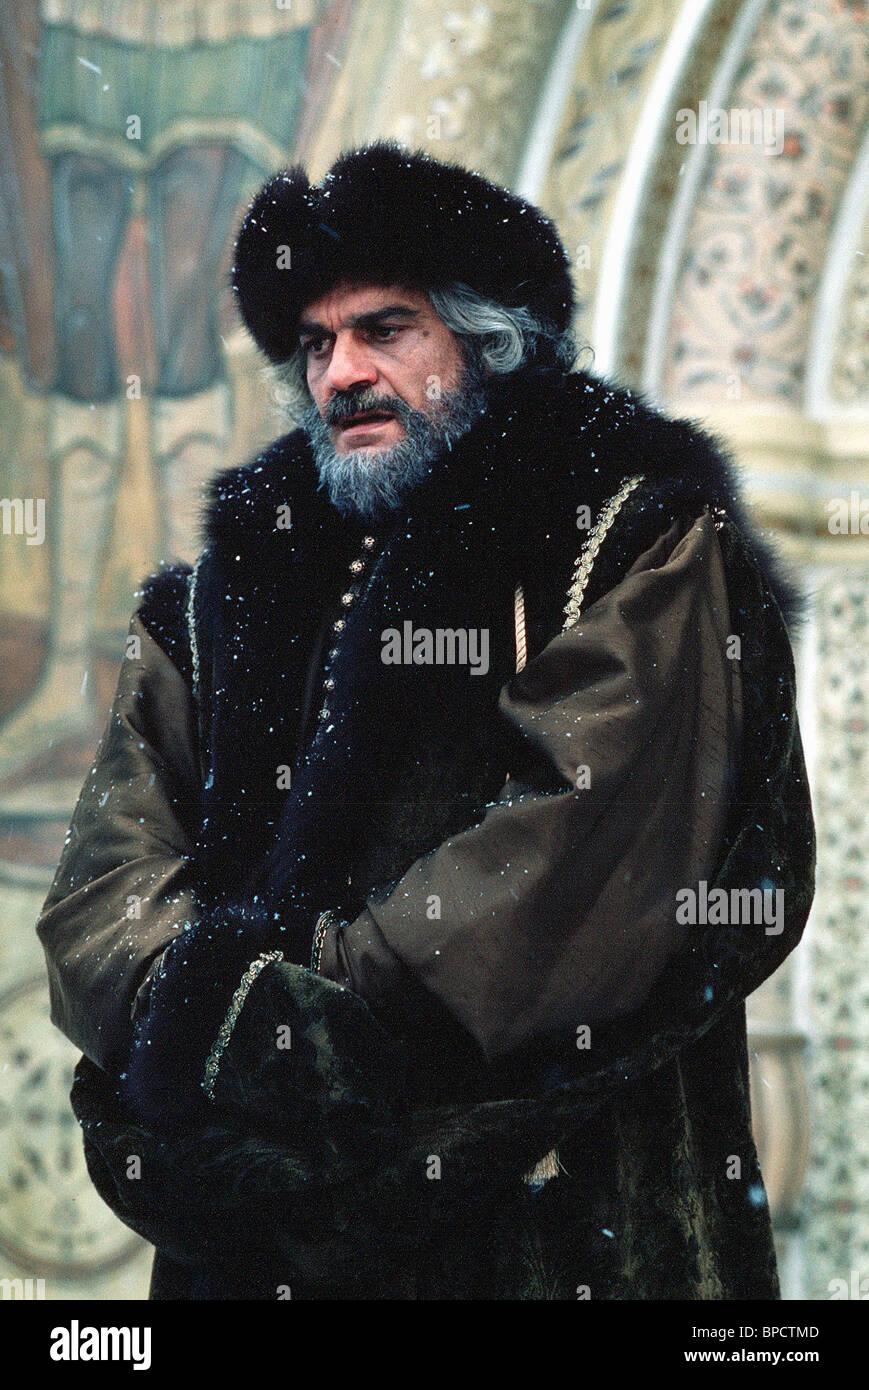 OMAR SHARIF PETER THE GREAT (1986) Stock Photo